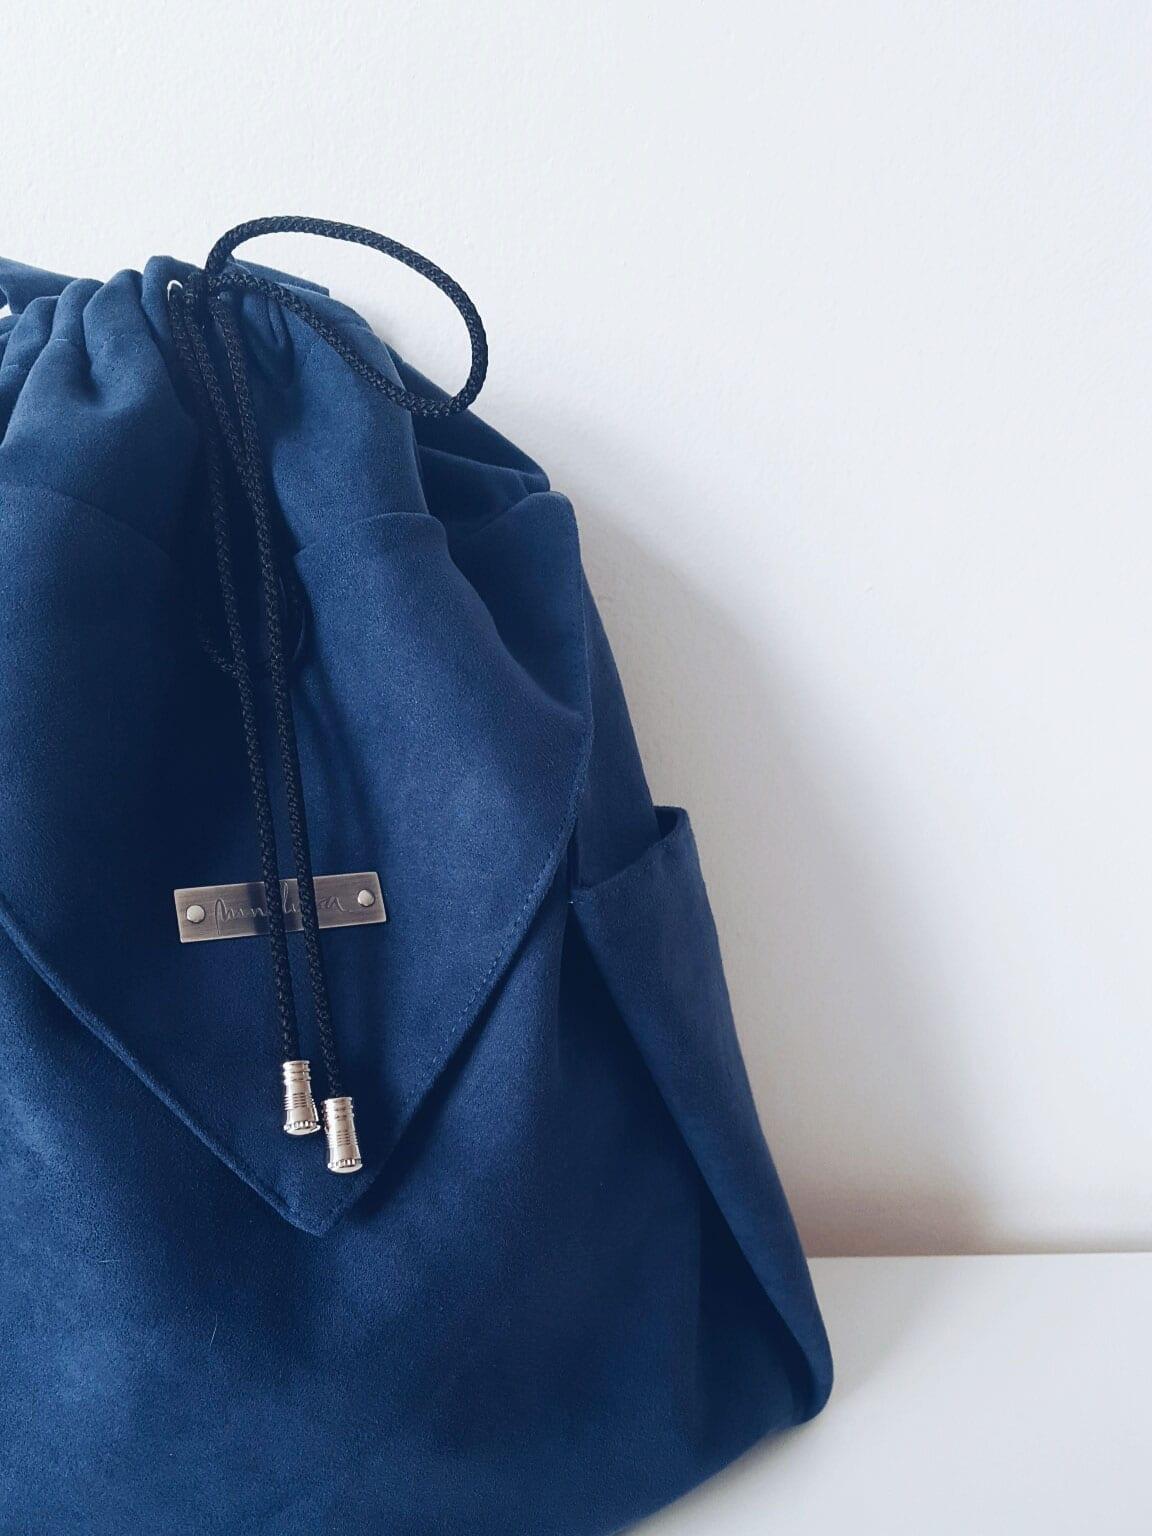 ORIGAMI Backpack_BlueJeans (2)